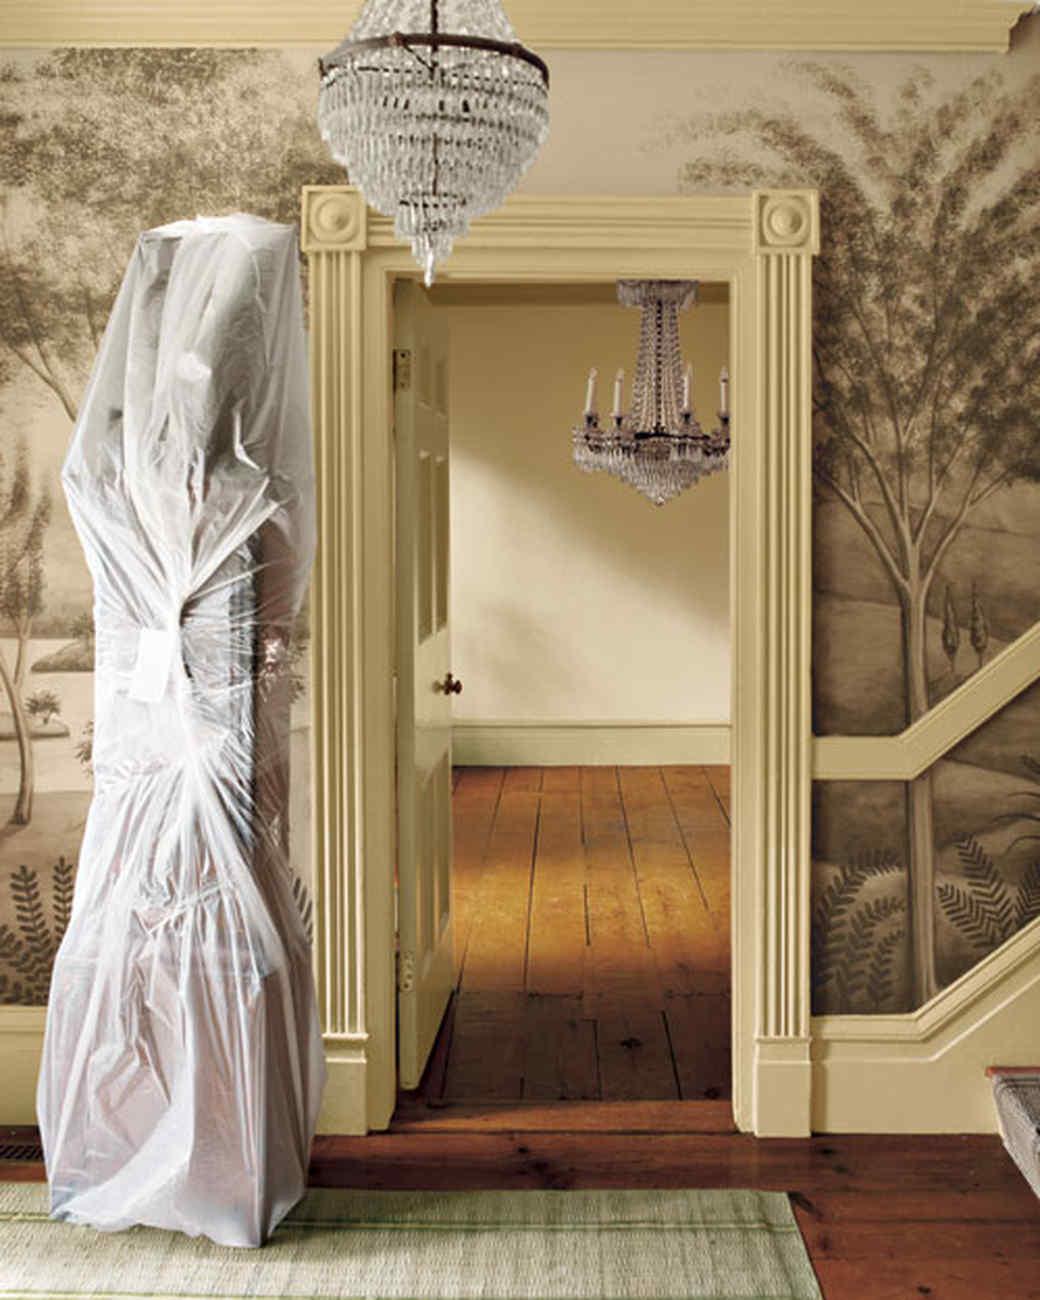 Martha Stewart Turkey Hill home featuring wall paper